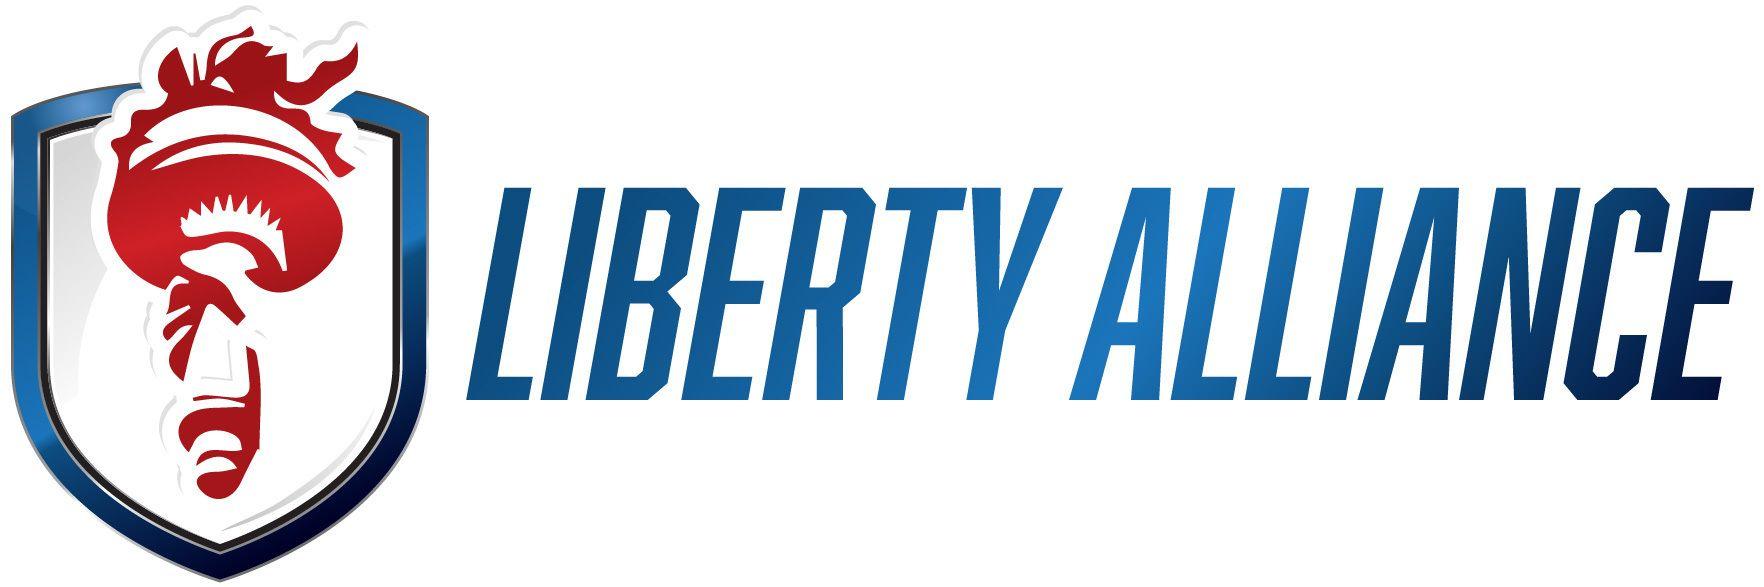 Mla horizontal color logo